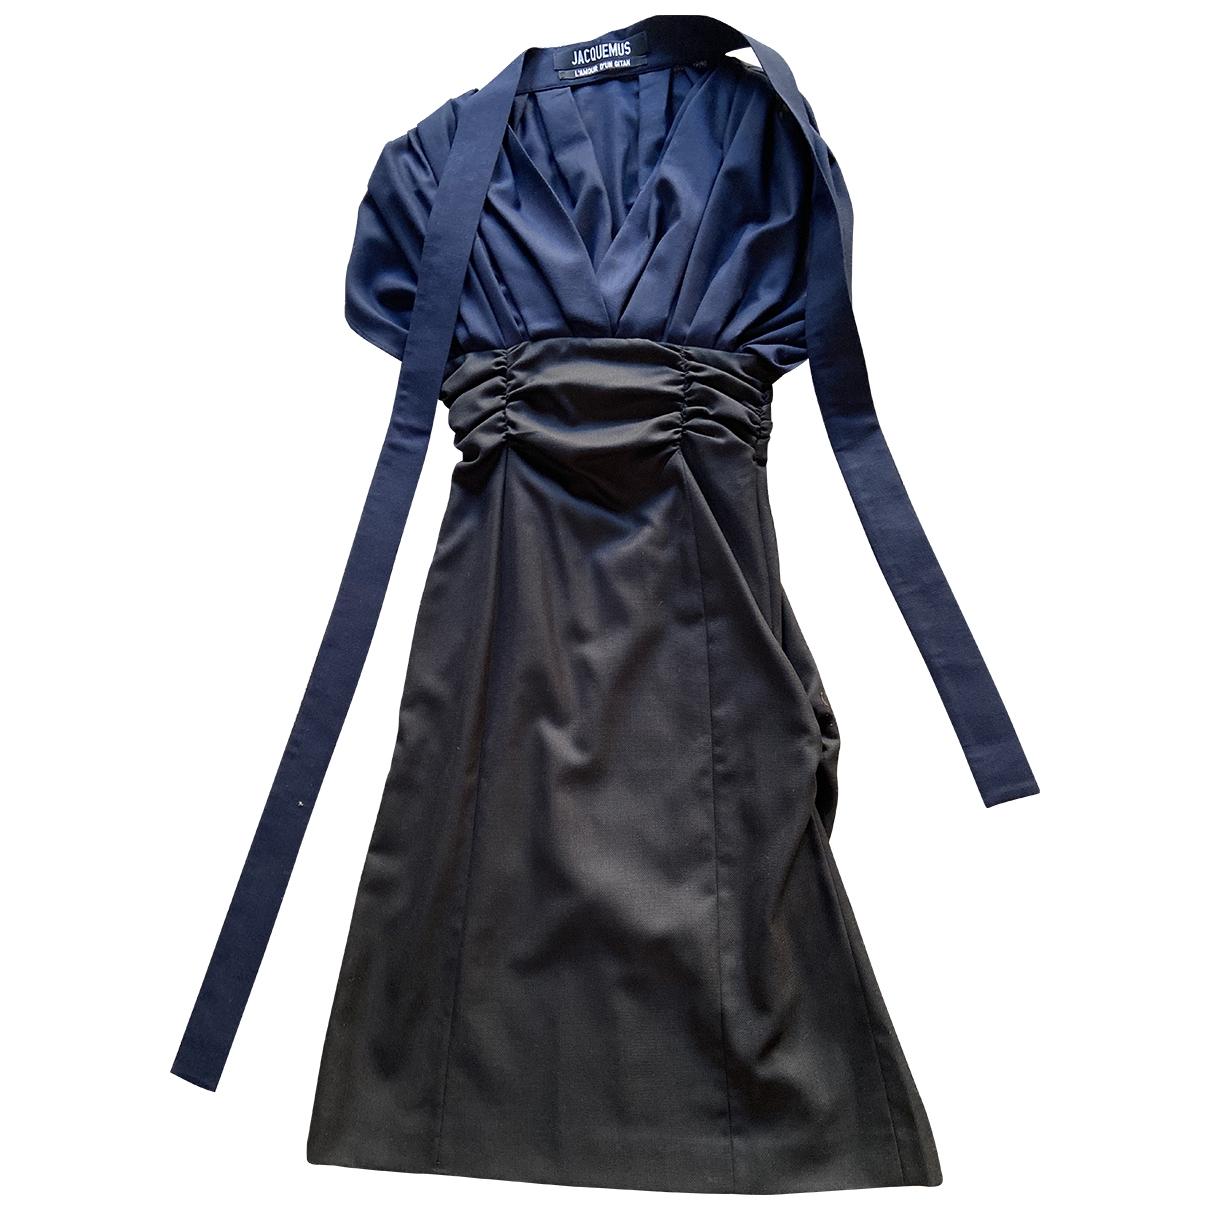 Jacquemus LAmour dun Gitan Navy Wool dress for Women 36 FR